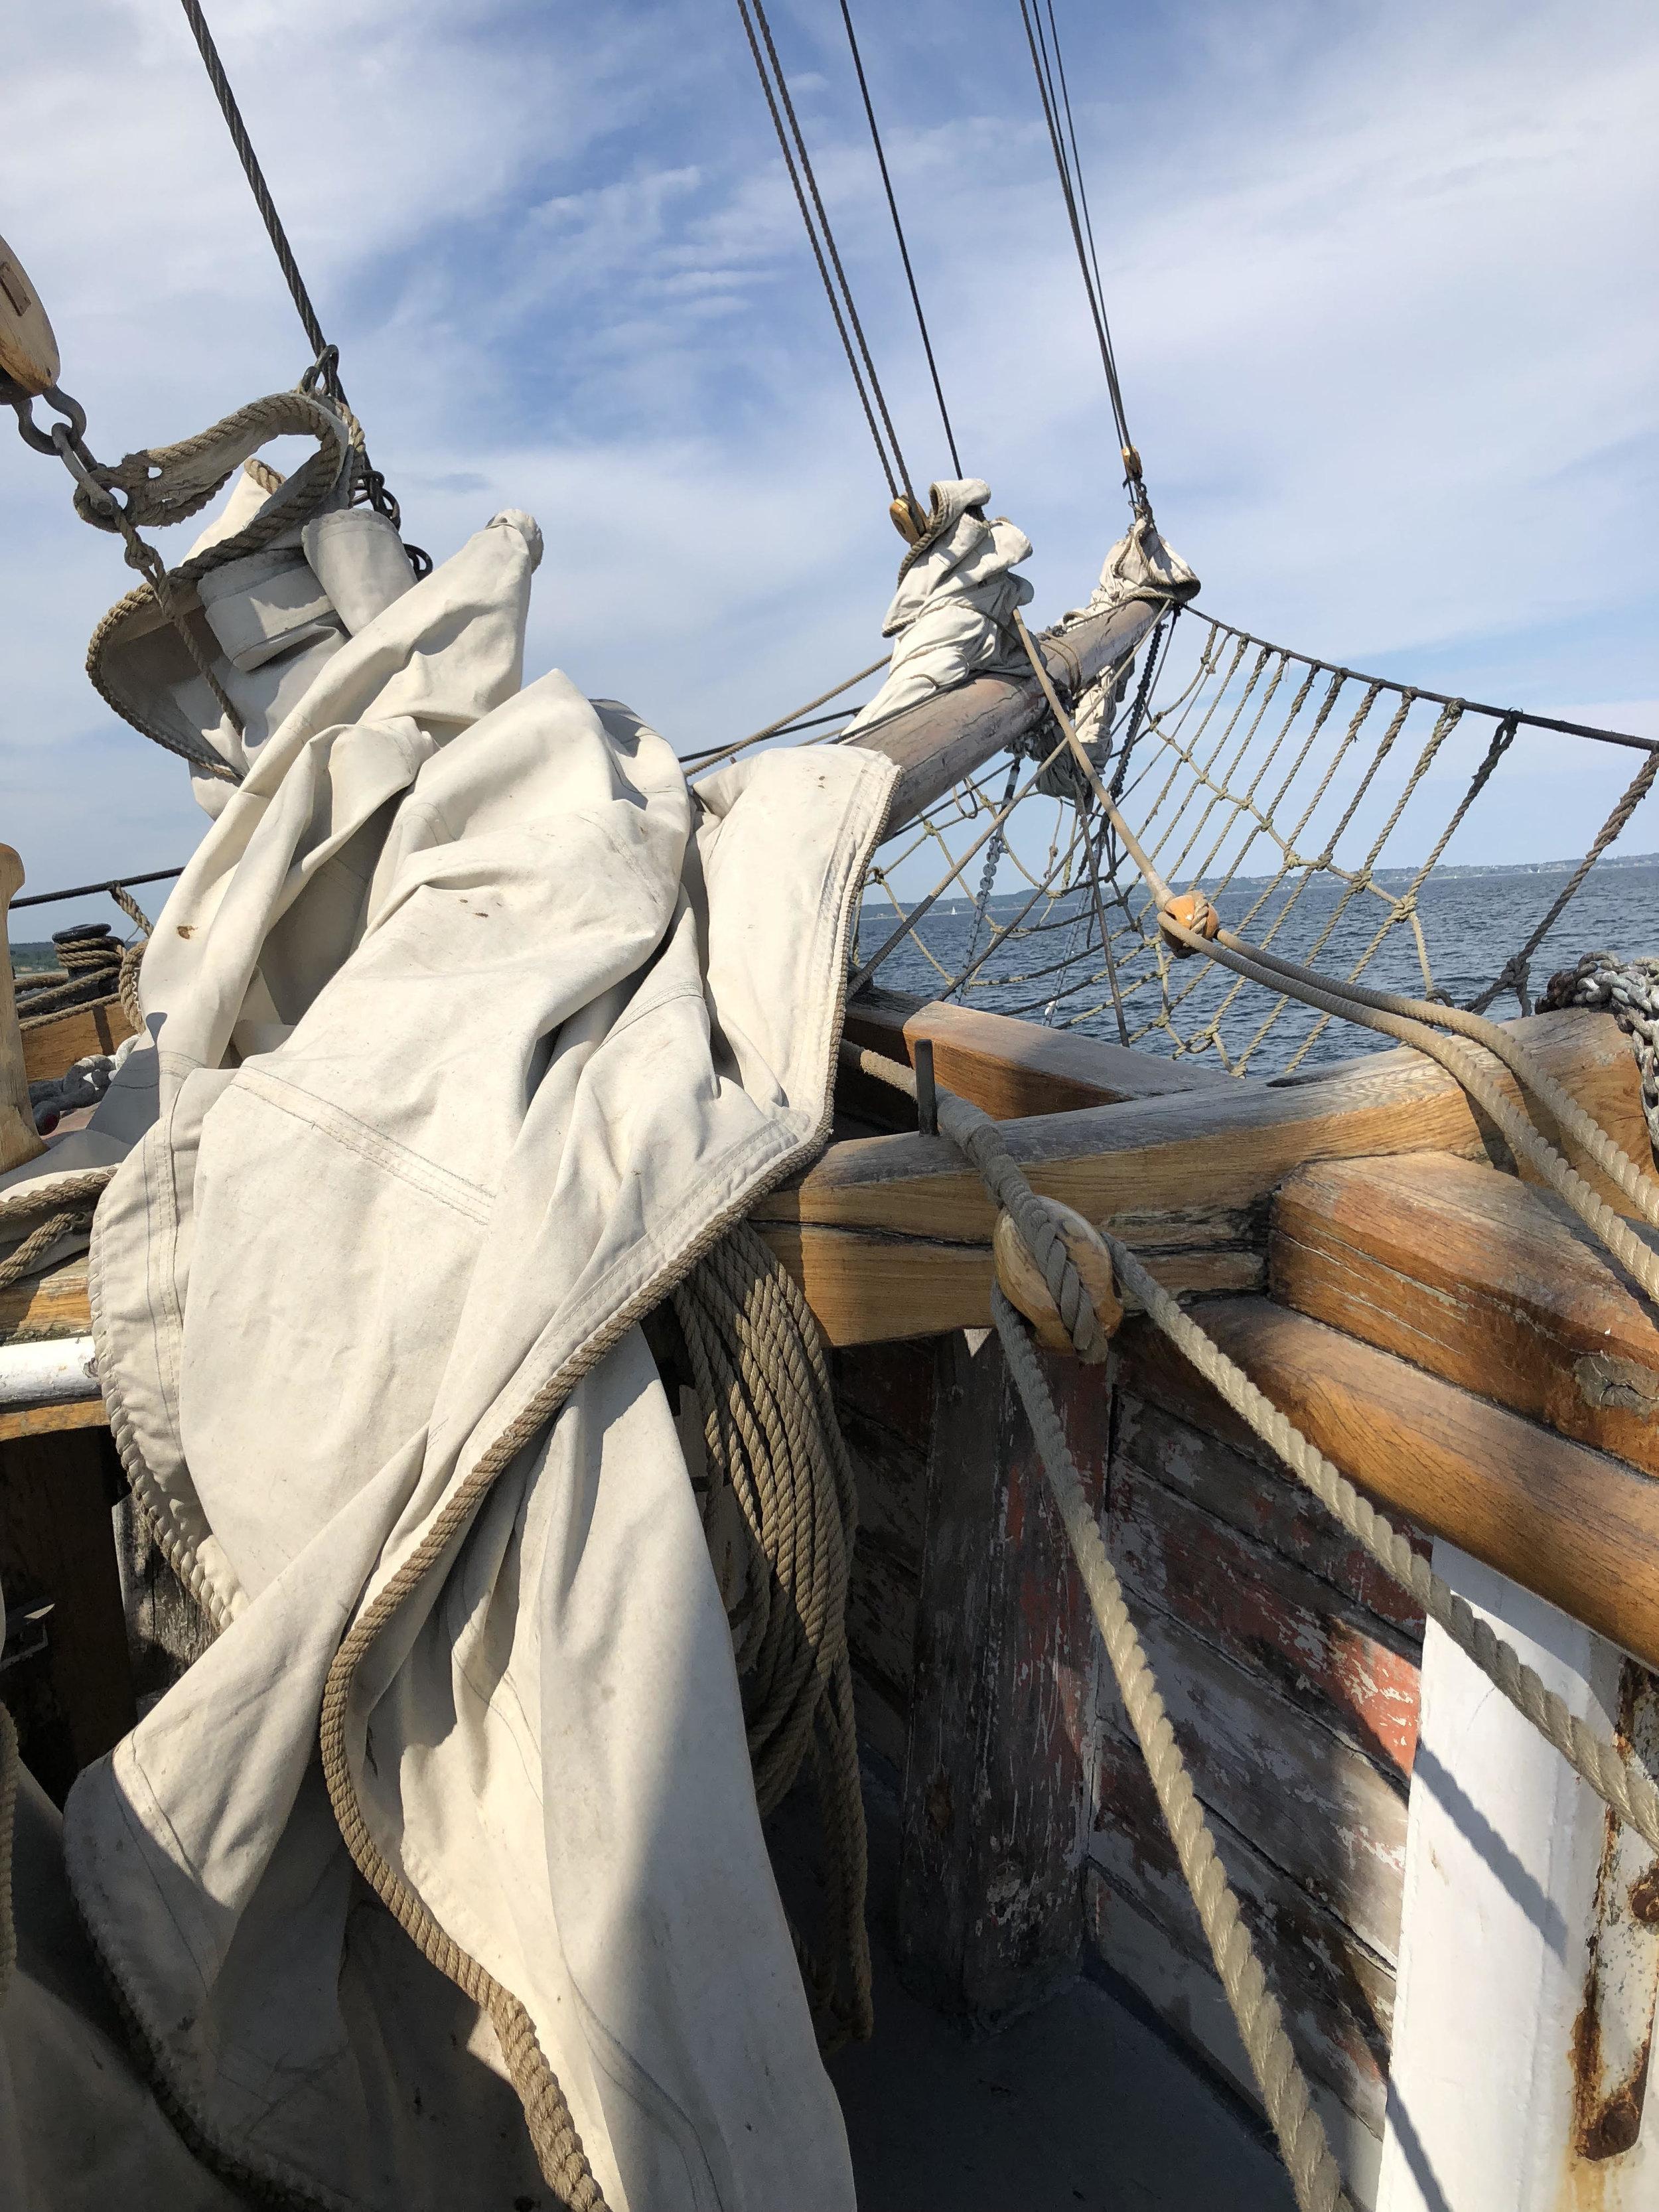 How every birthday should begin. Sailing off Jutland, Denmark.